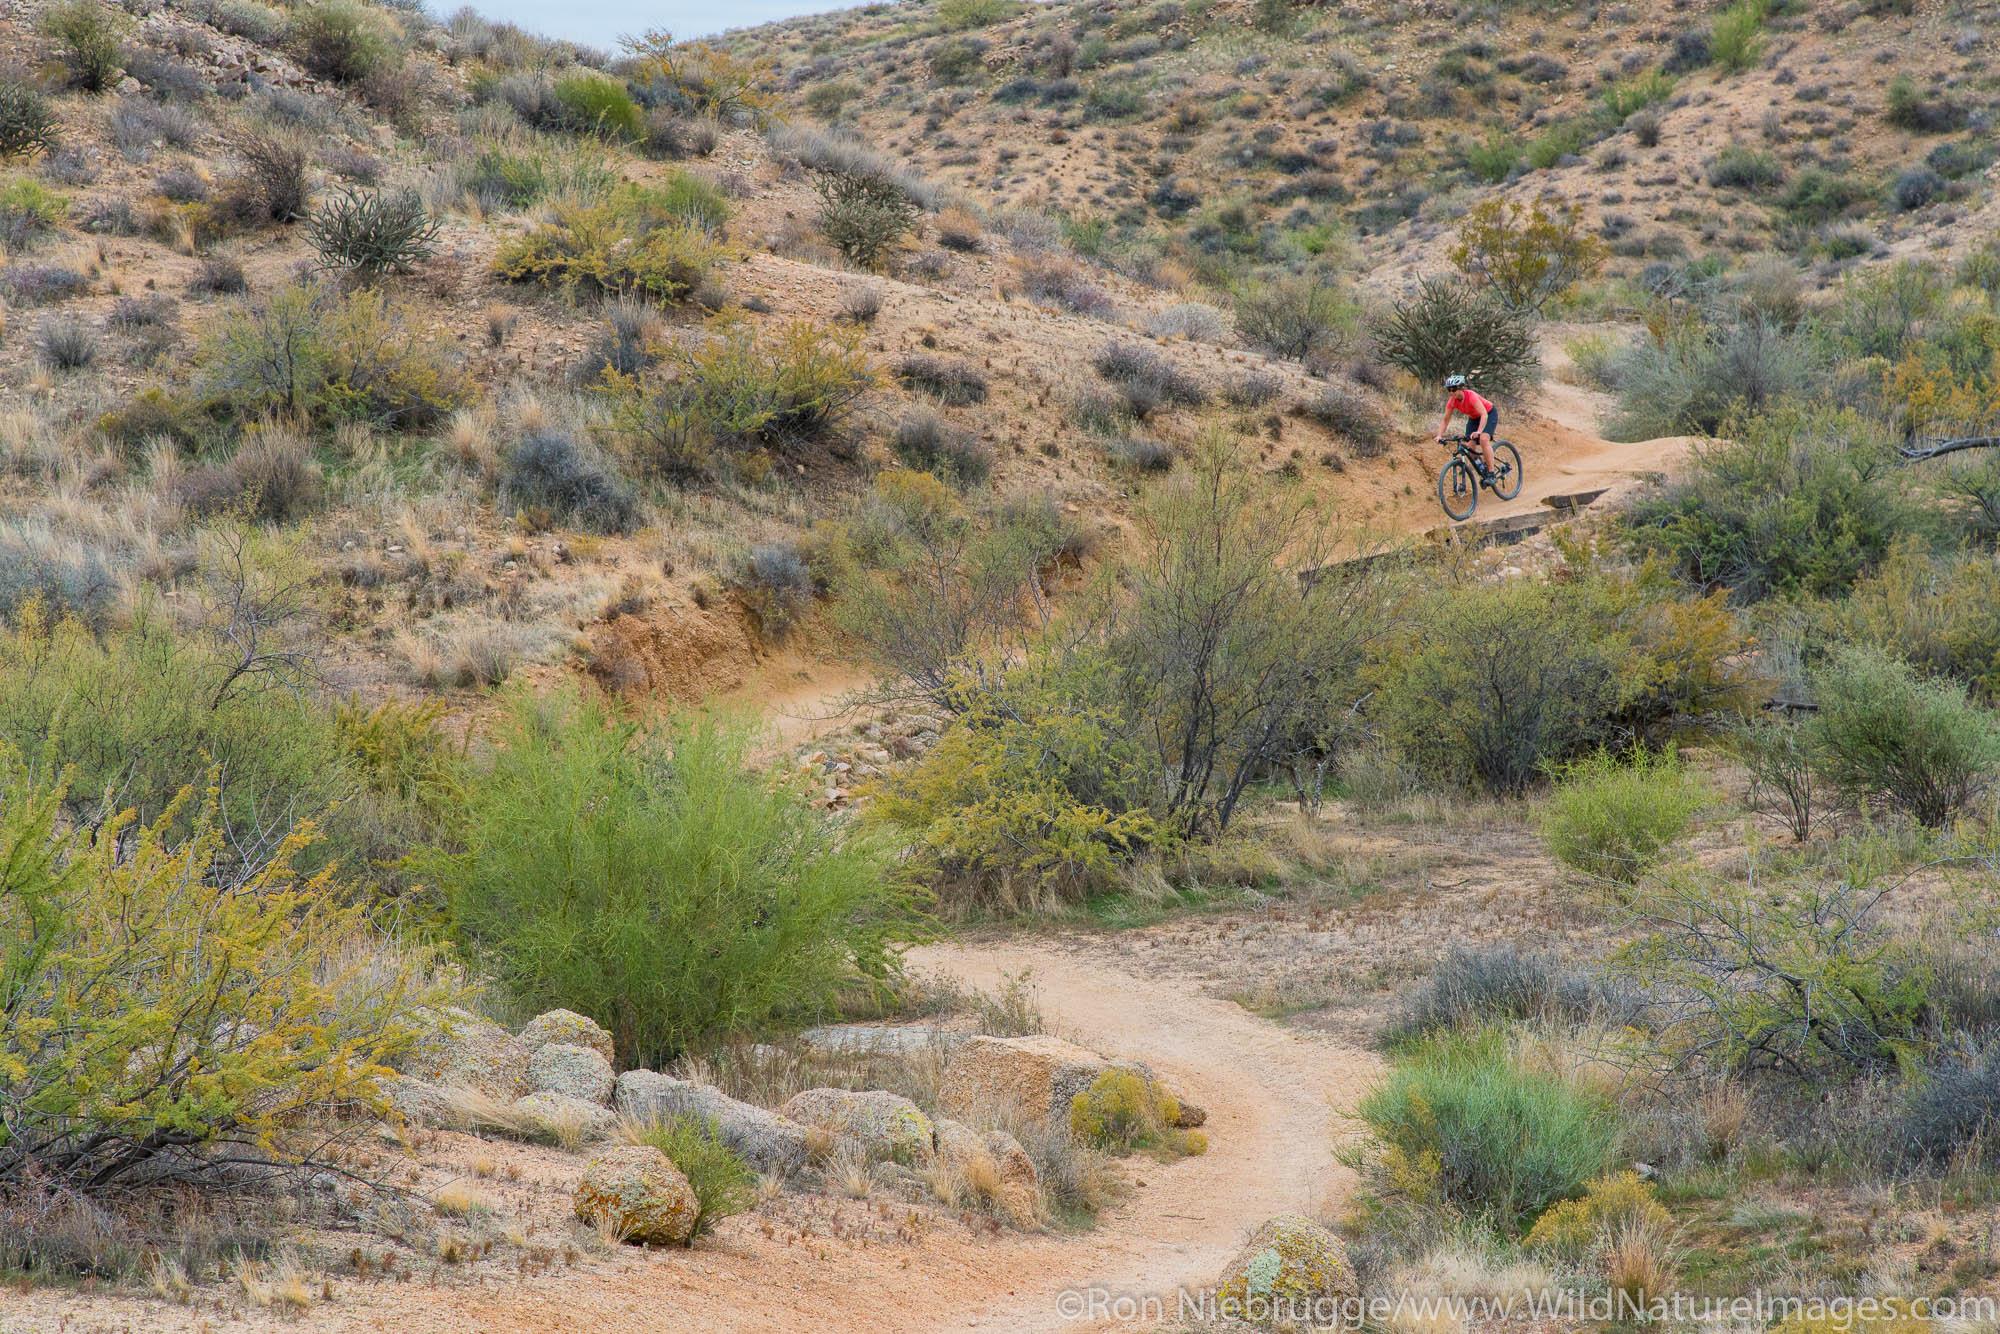 Mountain Biking, McDowell Mountain Regional Park, Near Fountain Hills and East of Phoenix, Arizona.